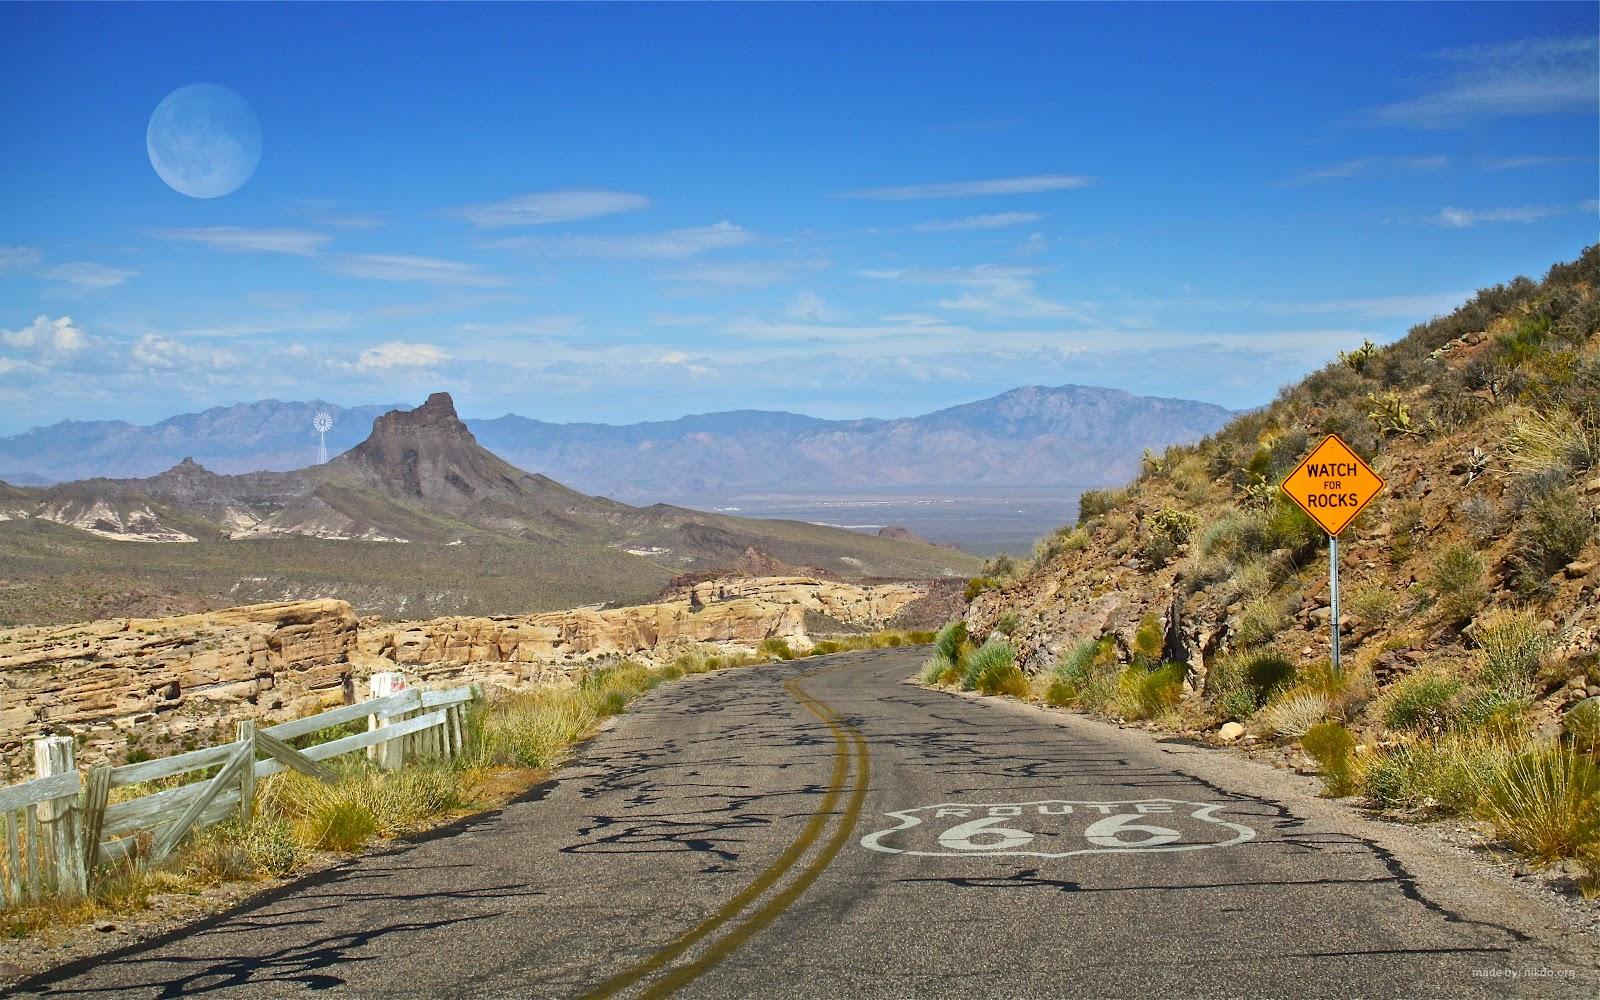 Route66-Watch-For-Rocks.jpg